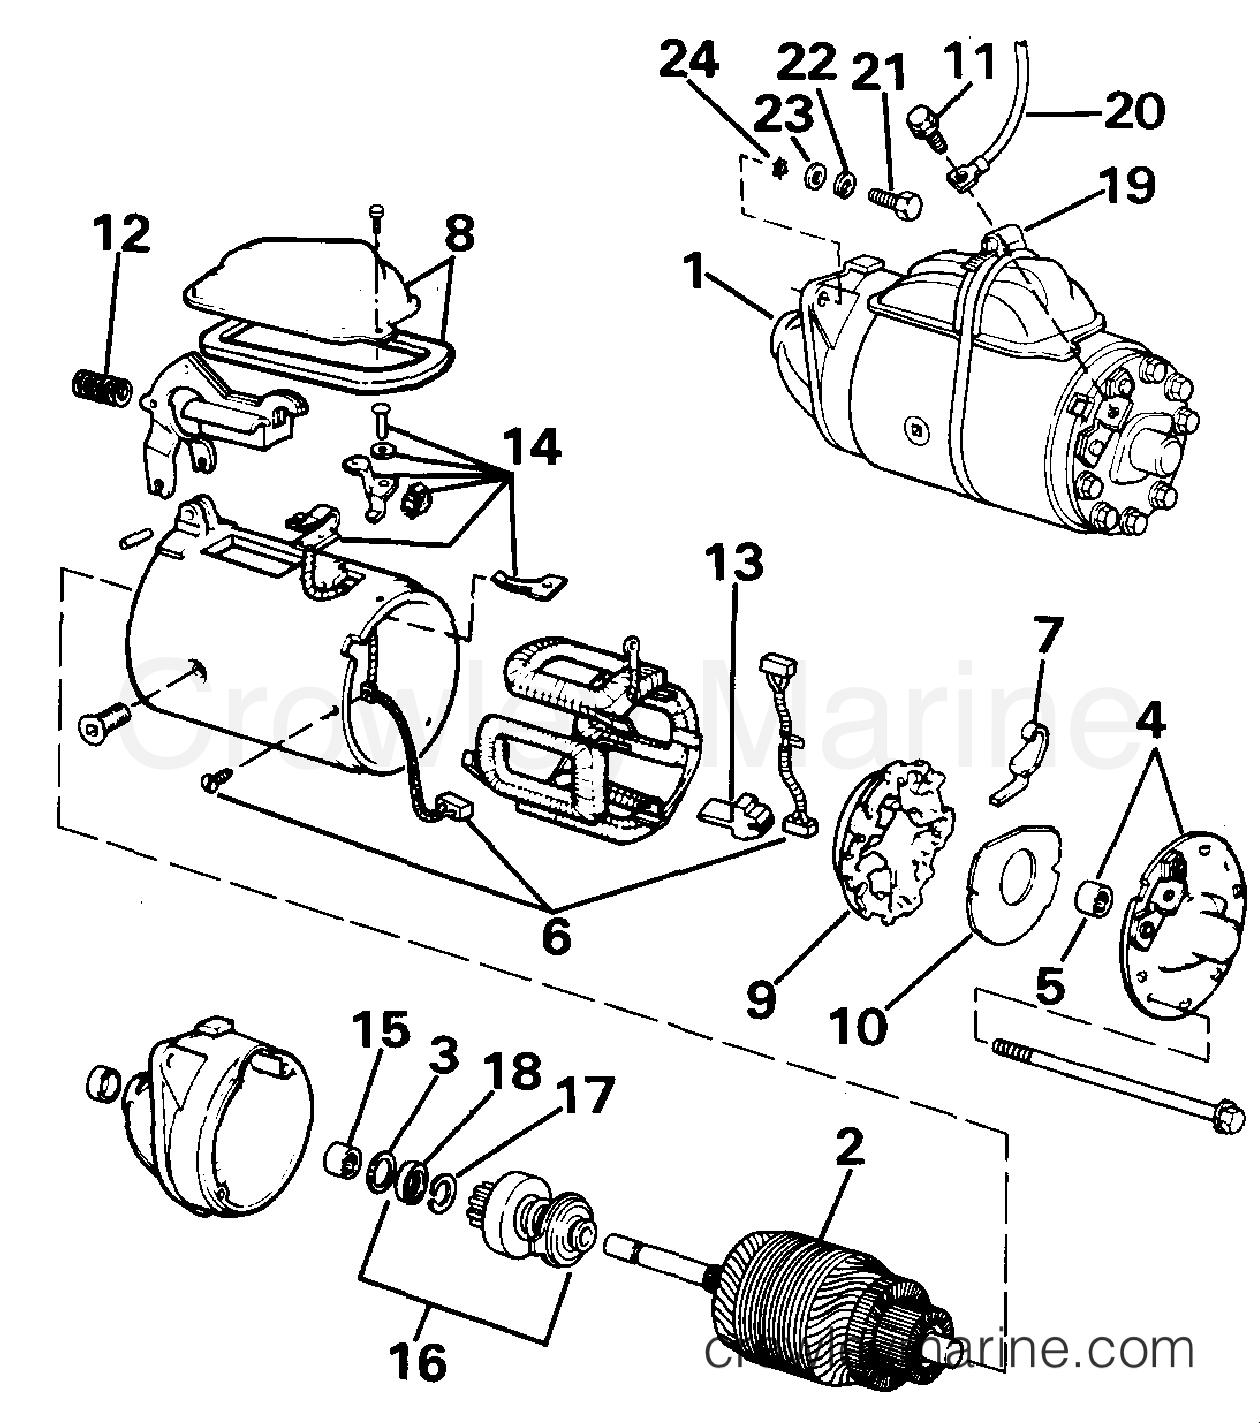 1990 OMC Stern Drive 2.3 - 232BMRPWS STARTER section